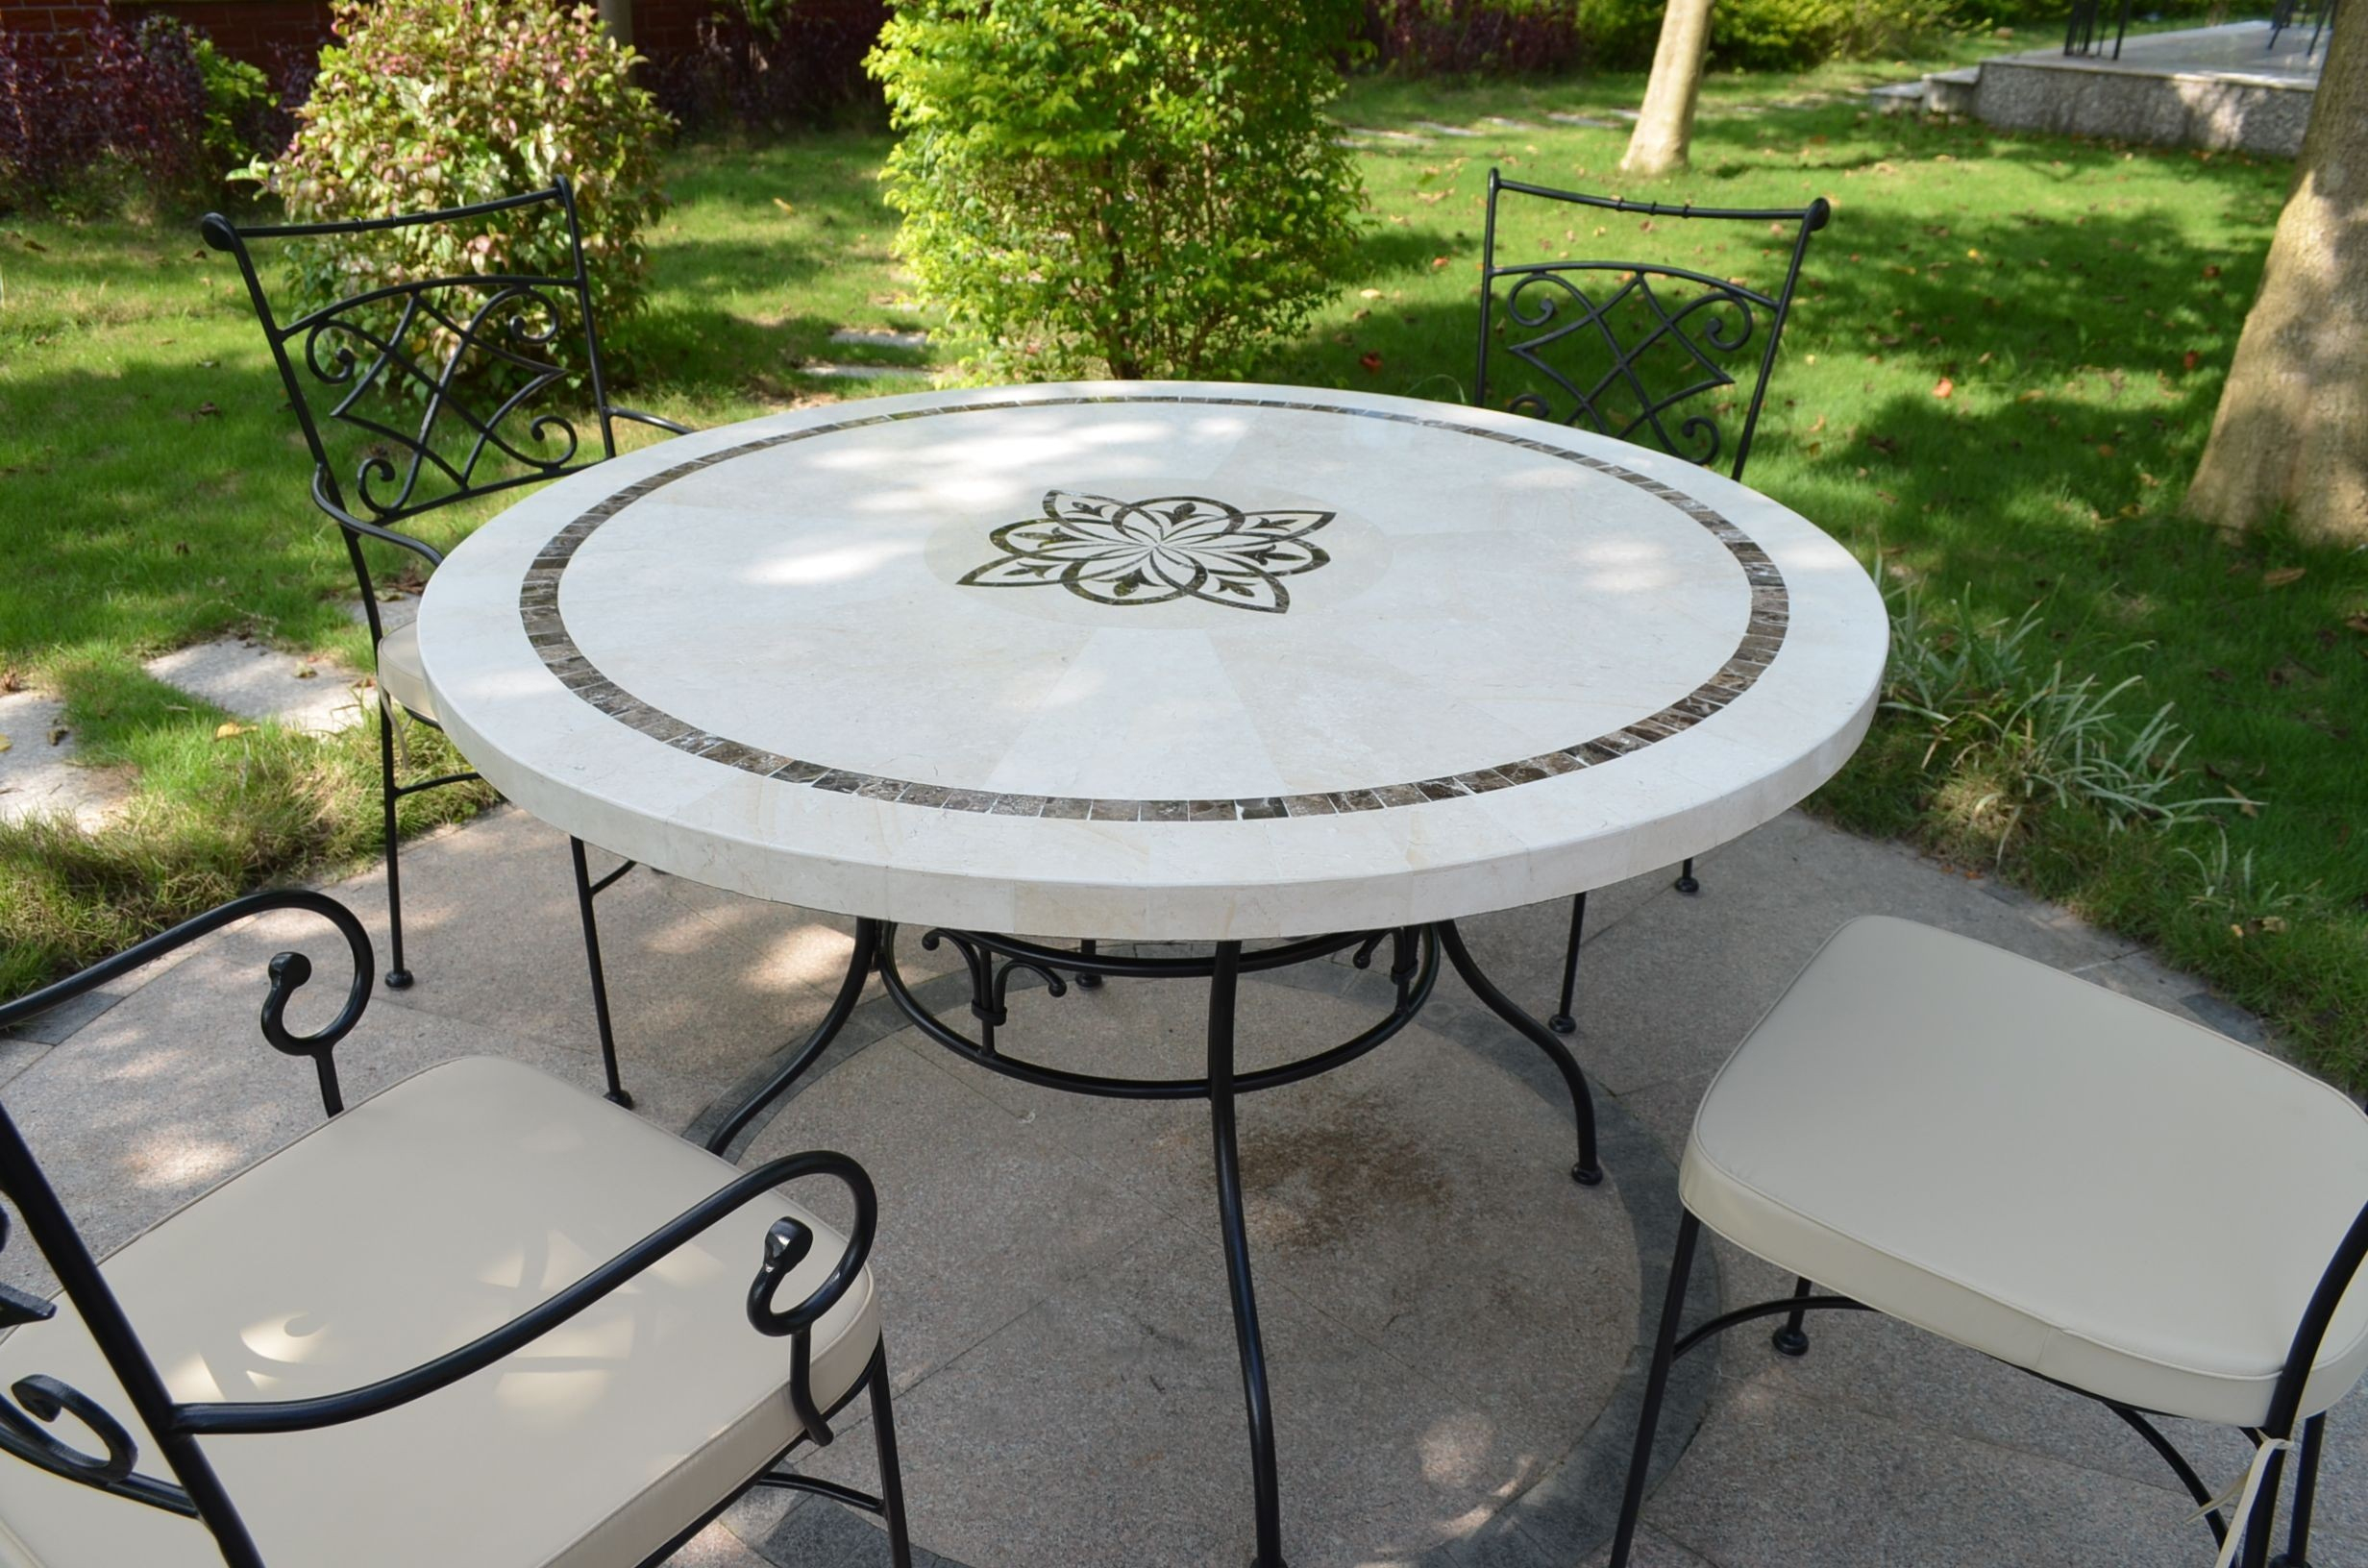 Table De Jardin Mosaïque Ronde 125 160 Emperador Travertin Marbella concernant Salon Jardin Mosaique